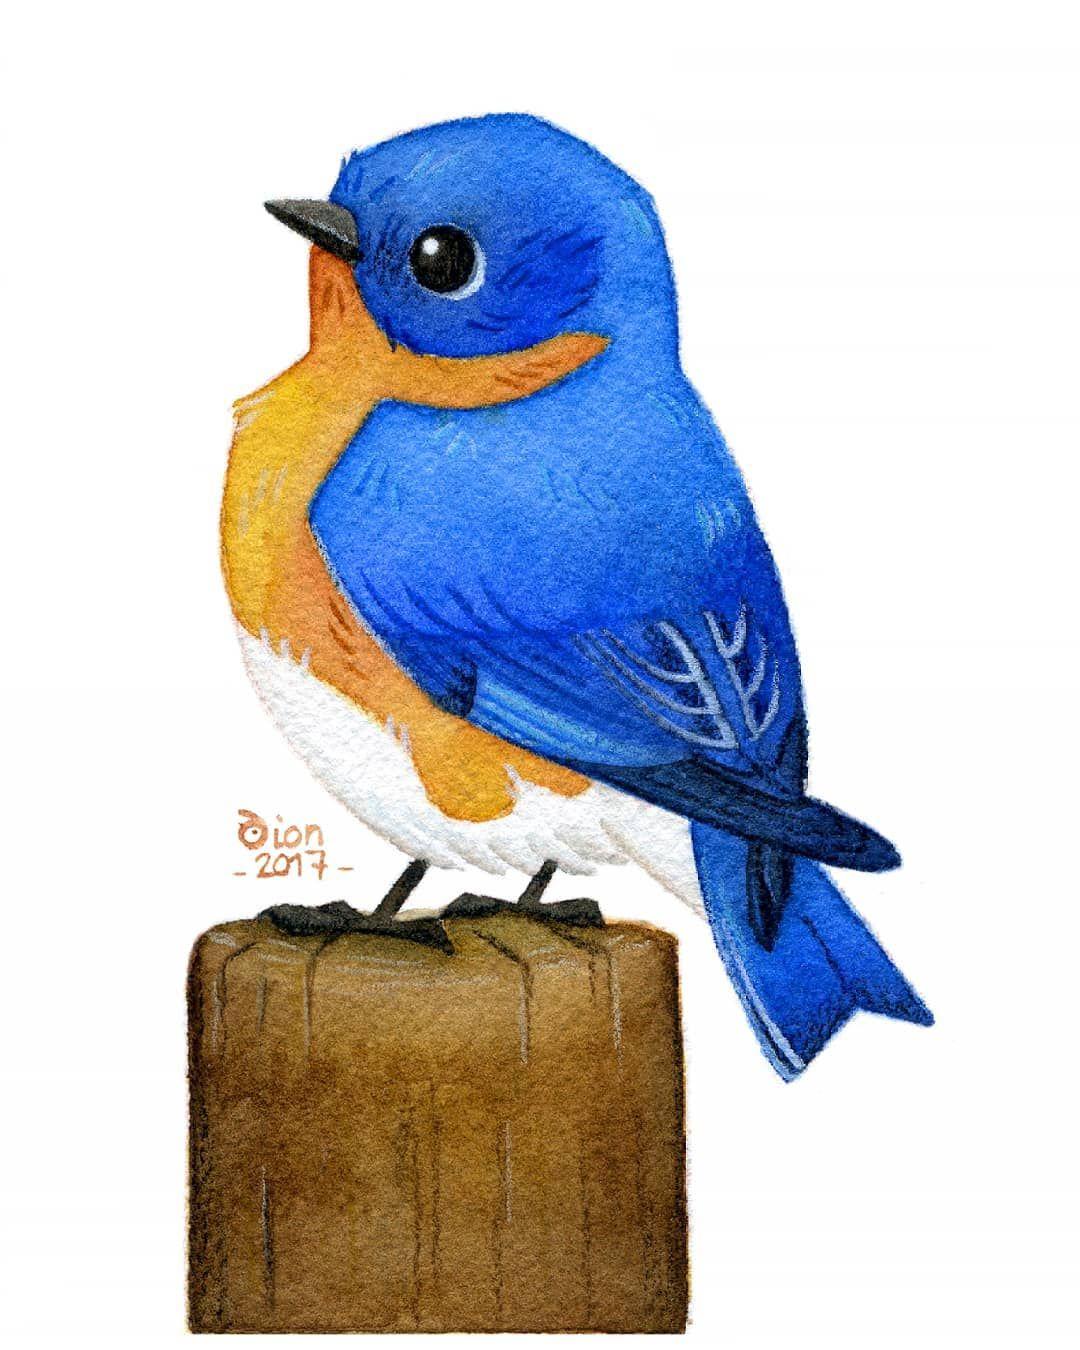 A Bird With Beautiful Colors The Eastern Bluebird Watercolor Watercolorpainting Painting Drawing Illustration Illustrator Aquarelle Bird Ornithol 동물